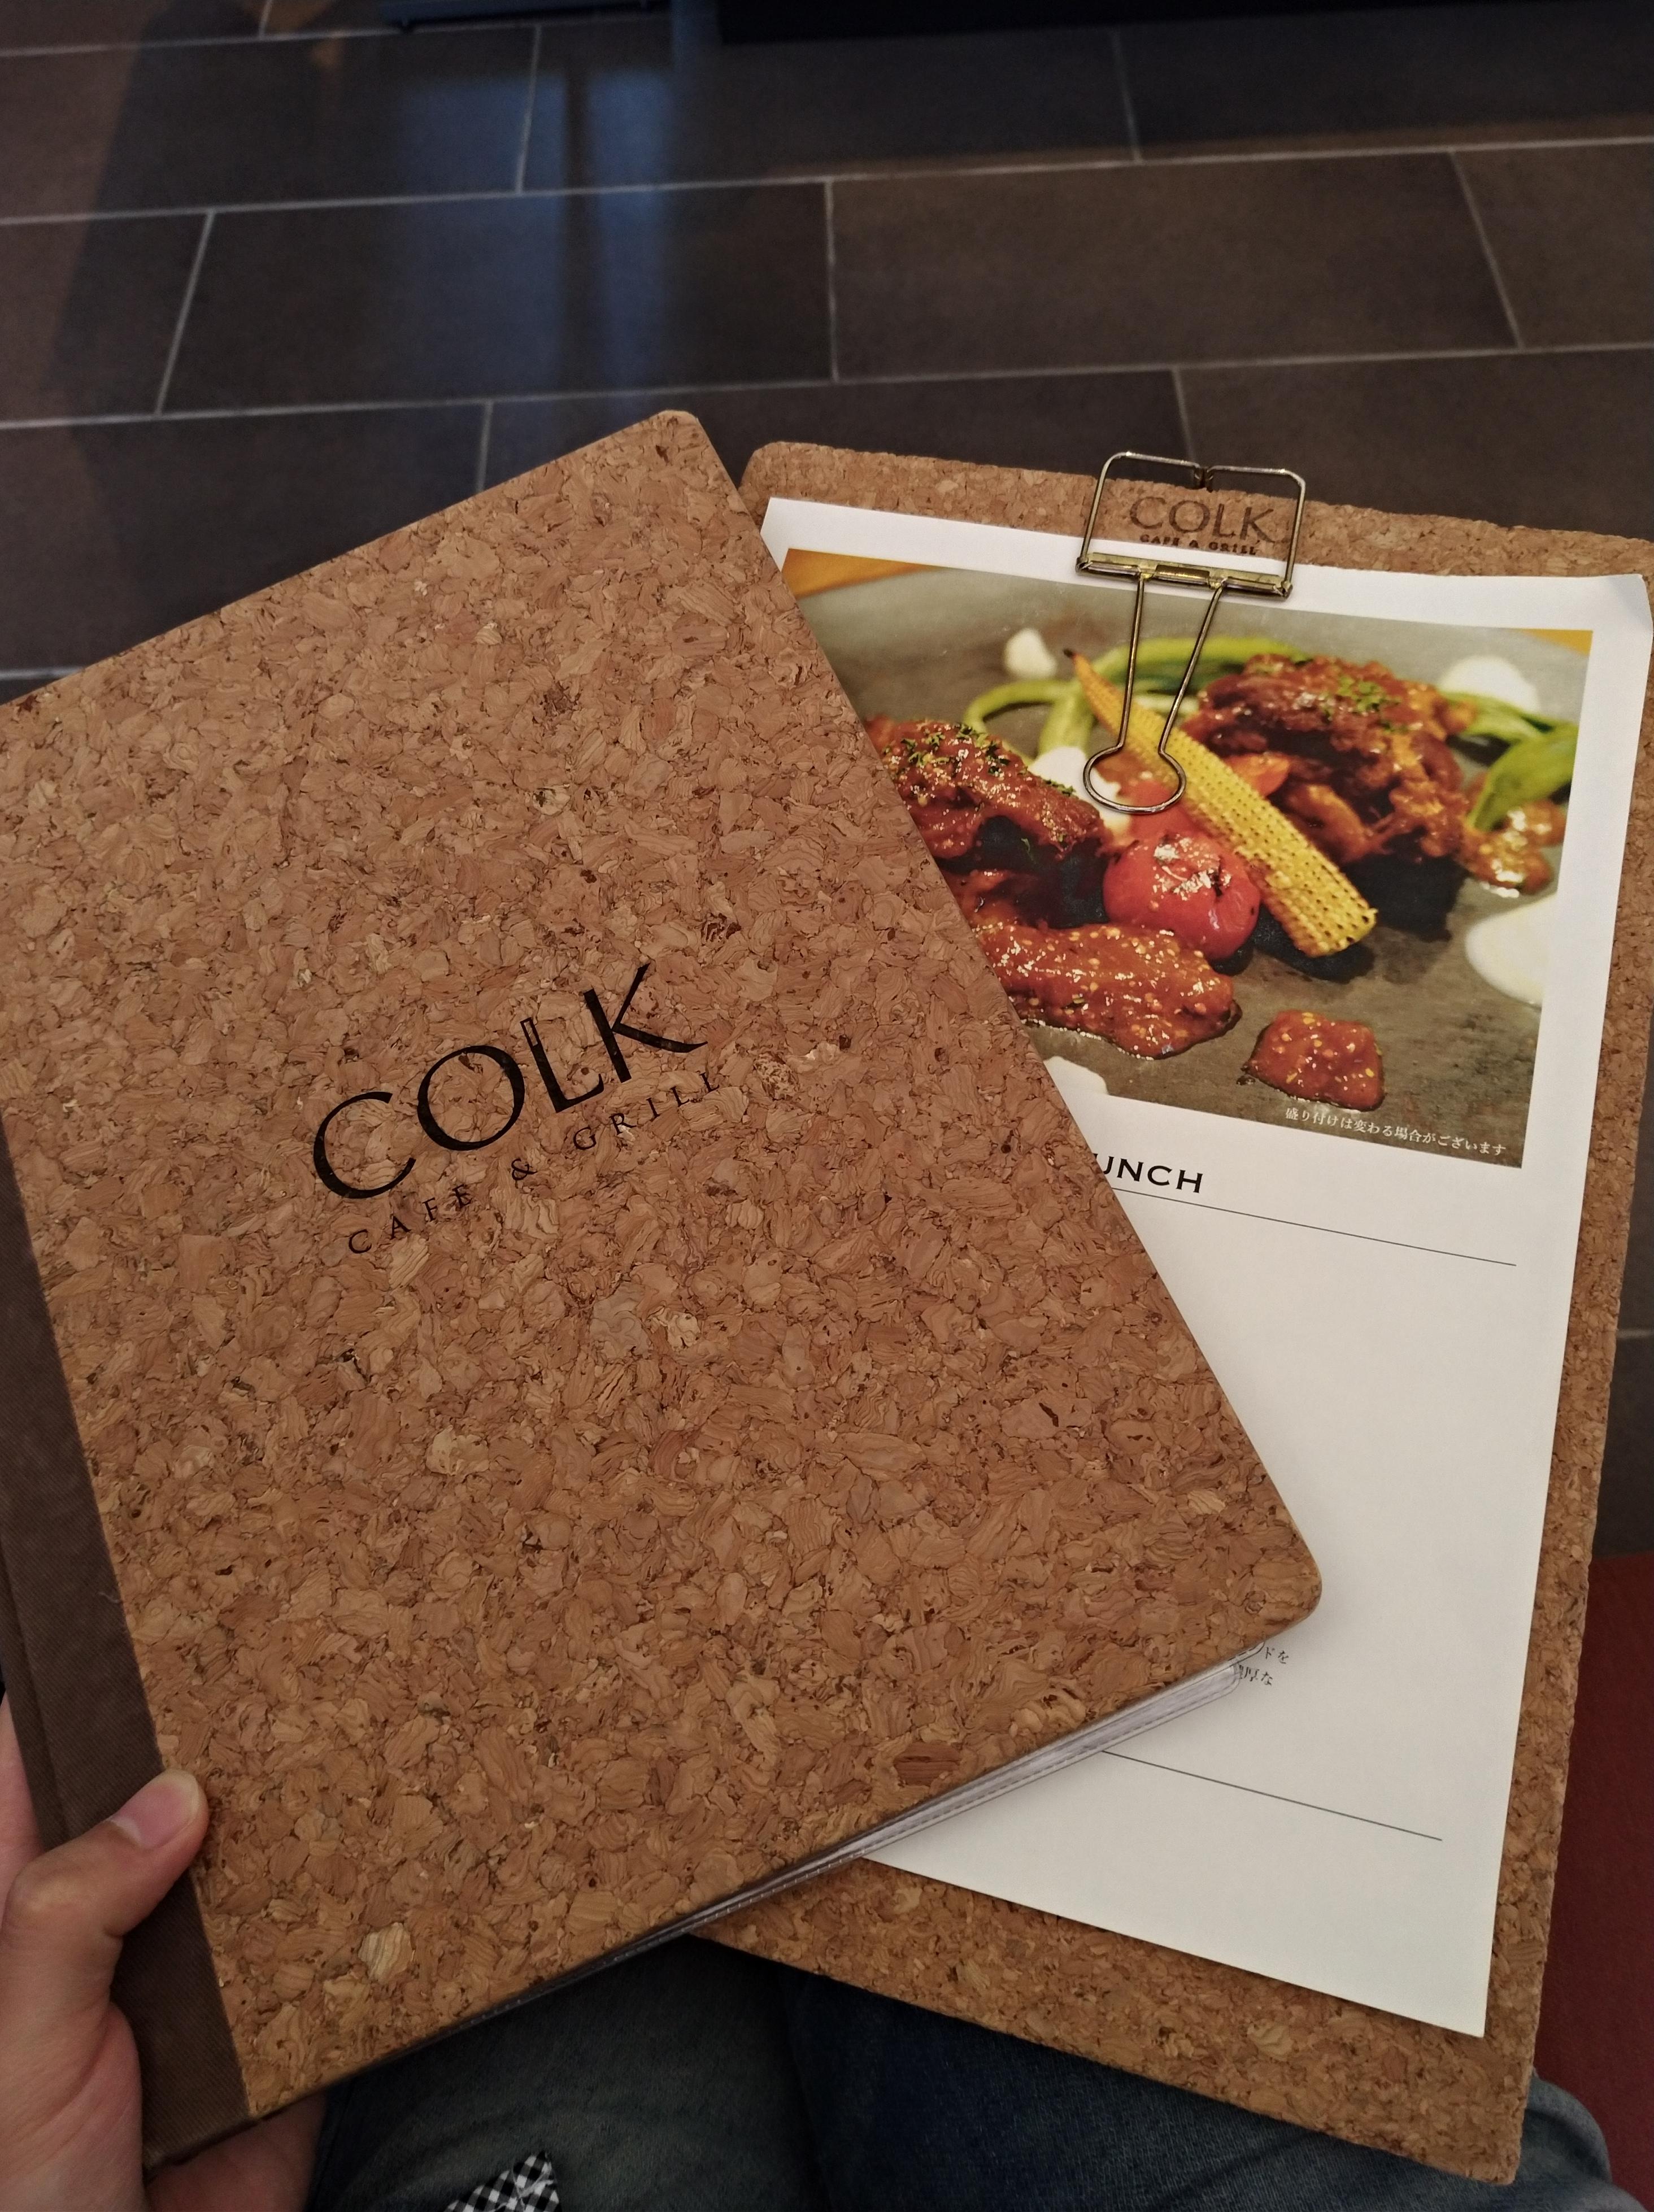 COLK(コルク)のメニュー